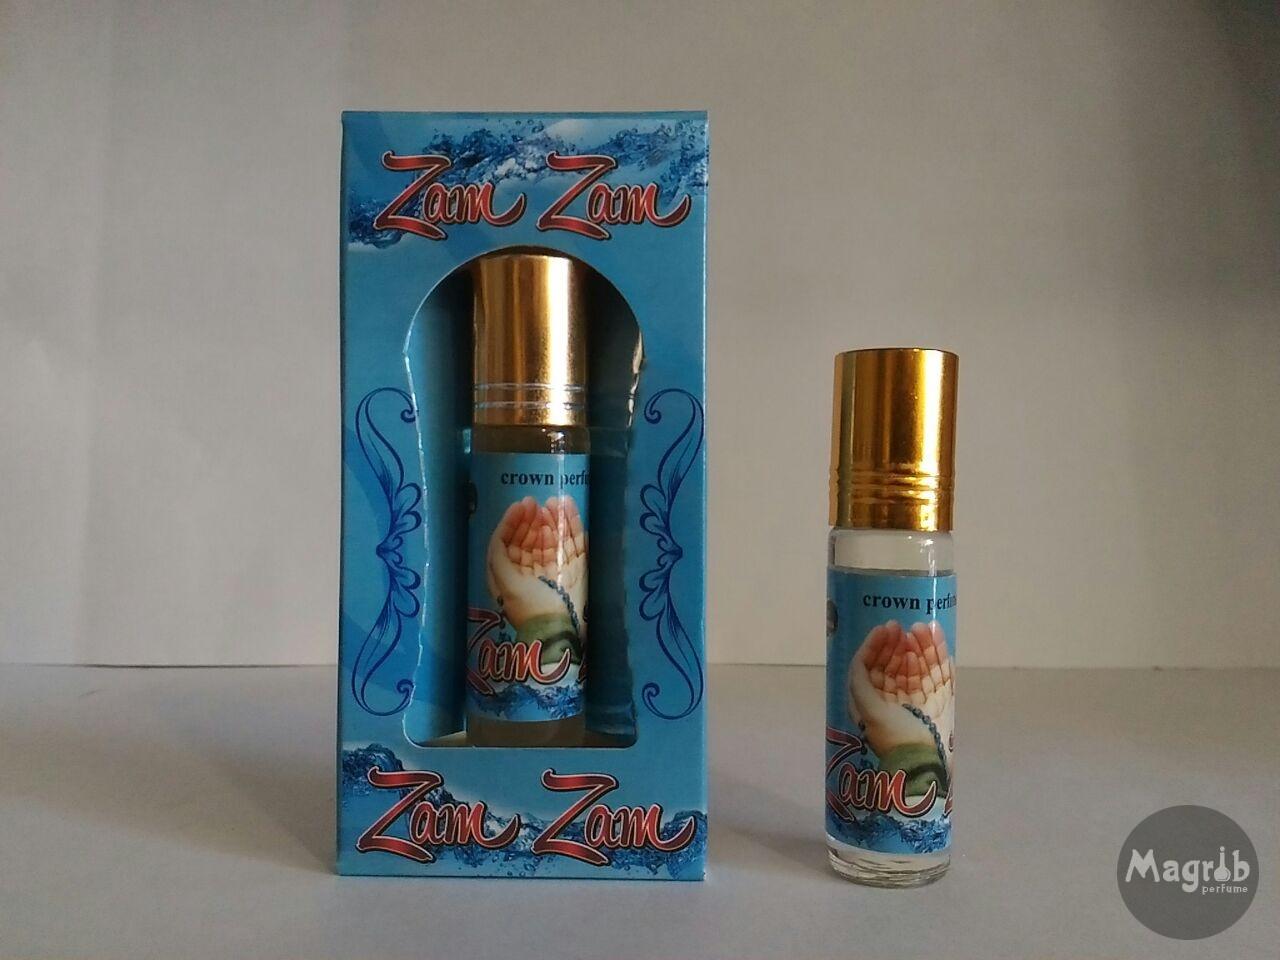 Al-Rayan Zam-Zam 6ml - унисекс, масляные духи